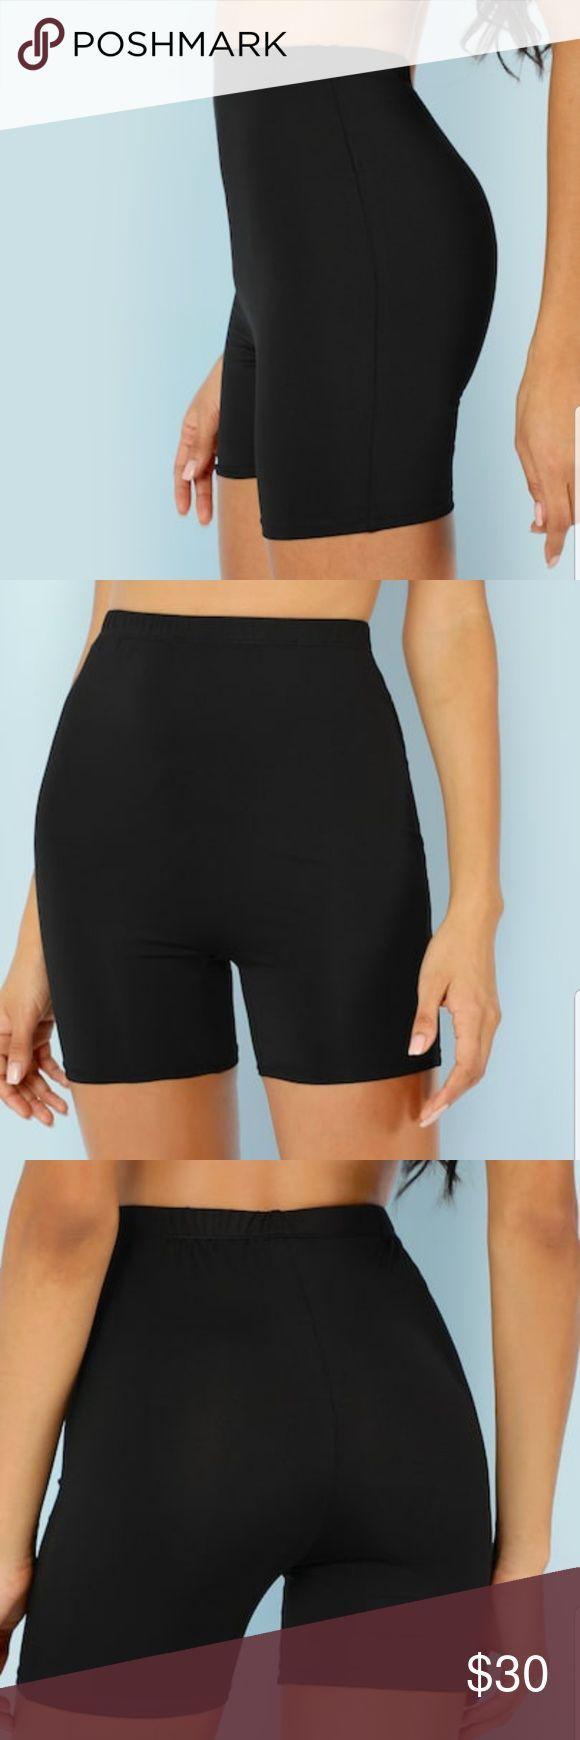 Black Biker shorts BLACK   BIKER SHORTS   CYCLING SHORTS    available in variou   – Biker shorts